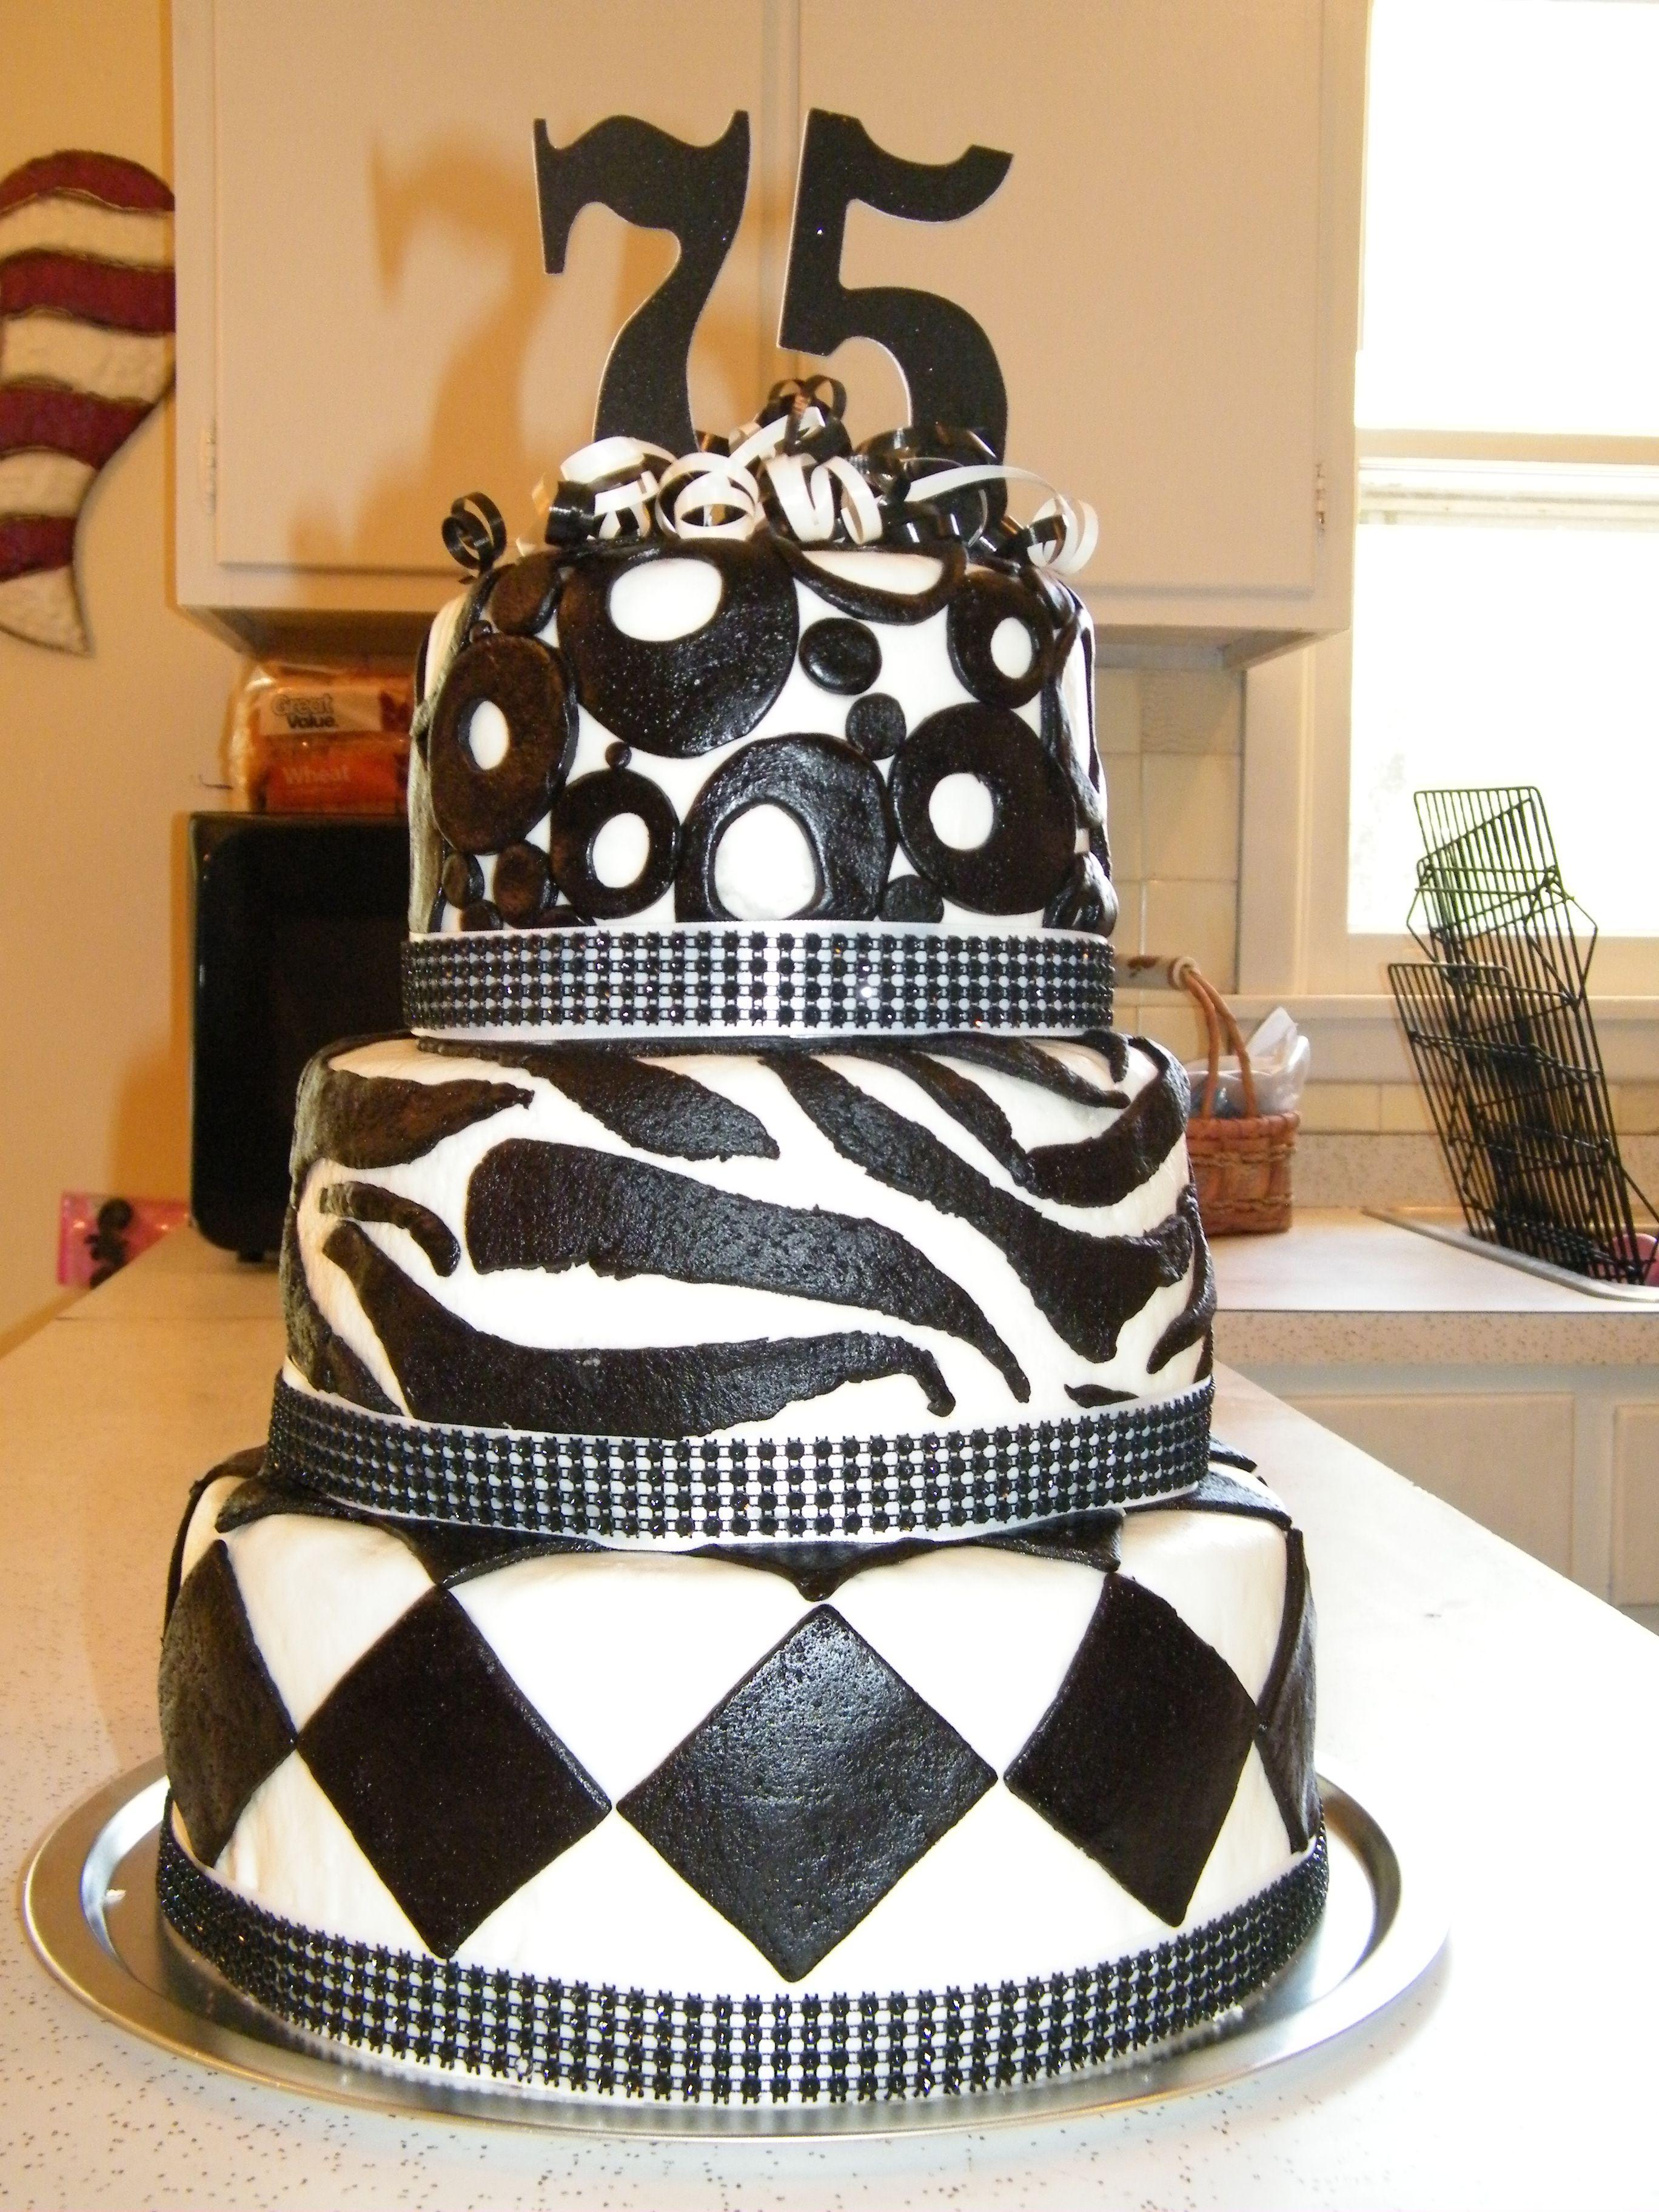 75th Birthday Cake cakes Pinterest 75th birthday cakes